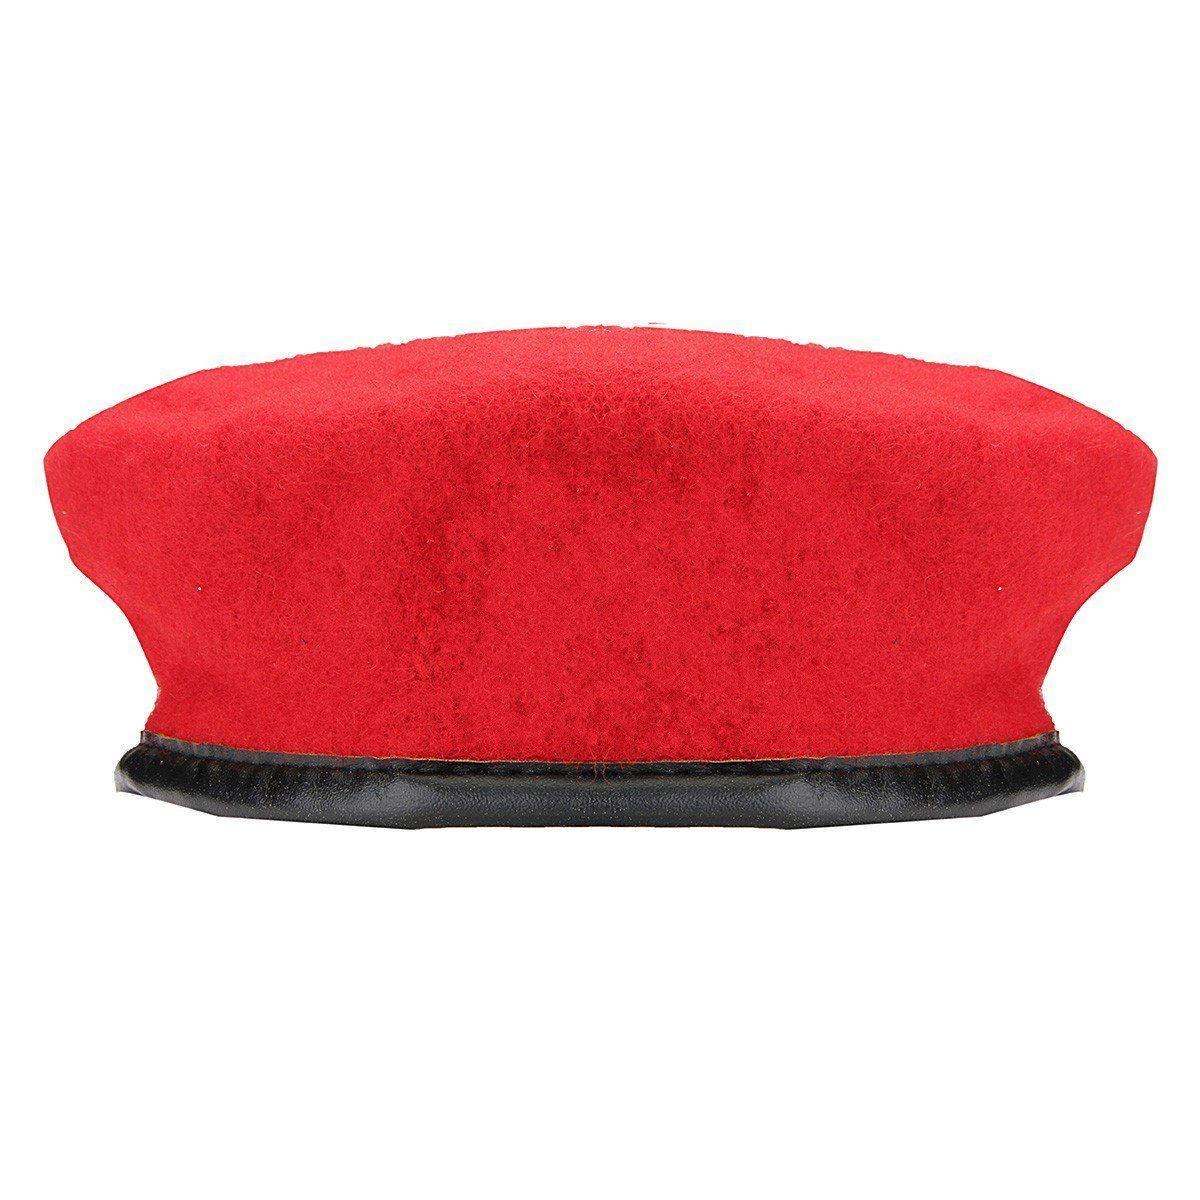 NEW BURGANDY WOOL MENS LADIES BERET CAP HAT ARMY MILITARY FANCY DRESS TACTICAL